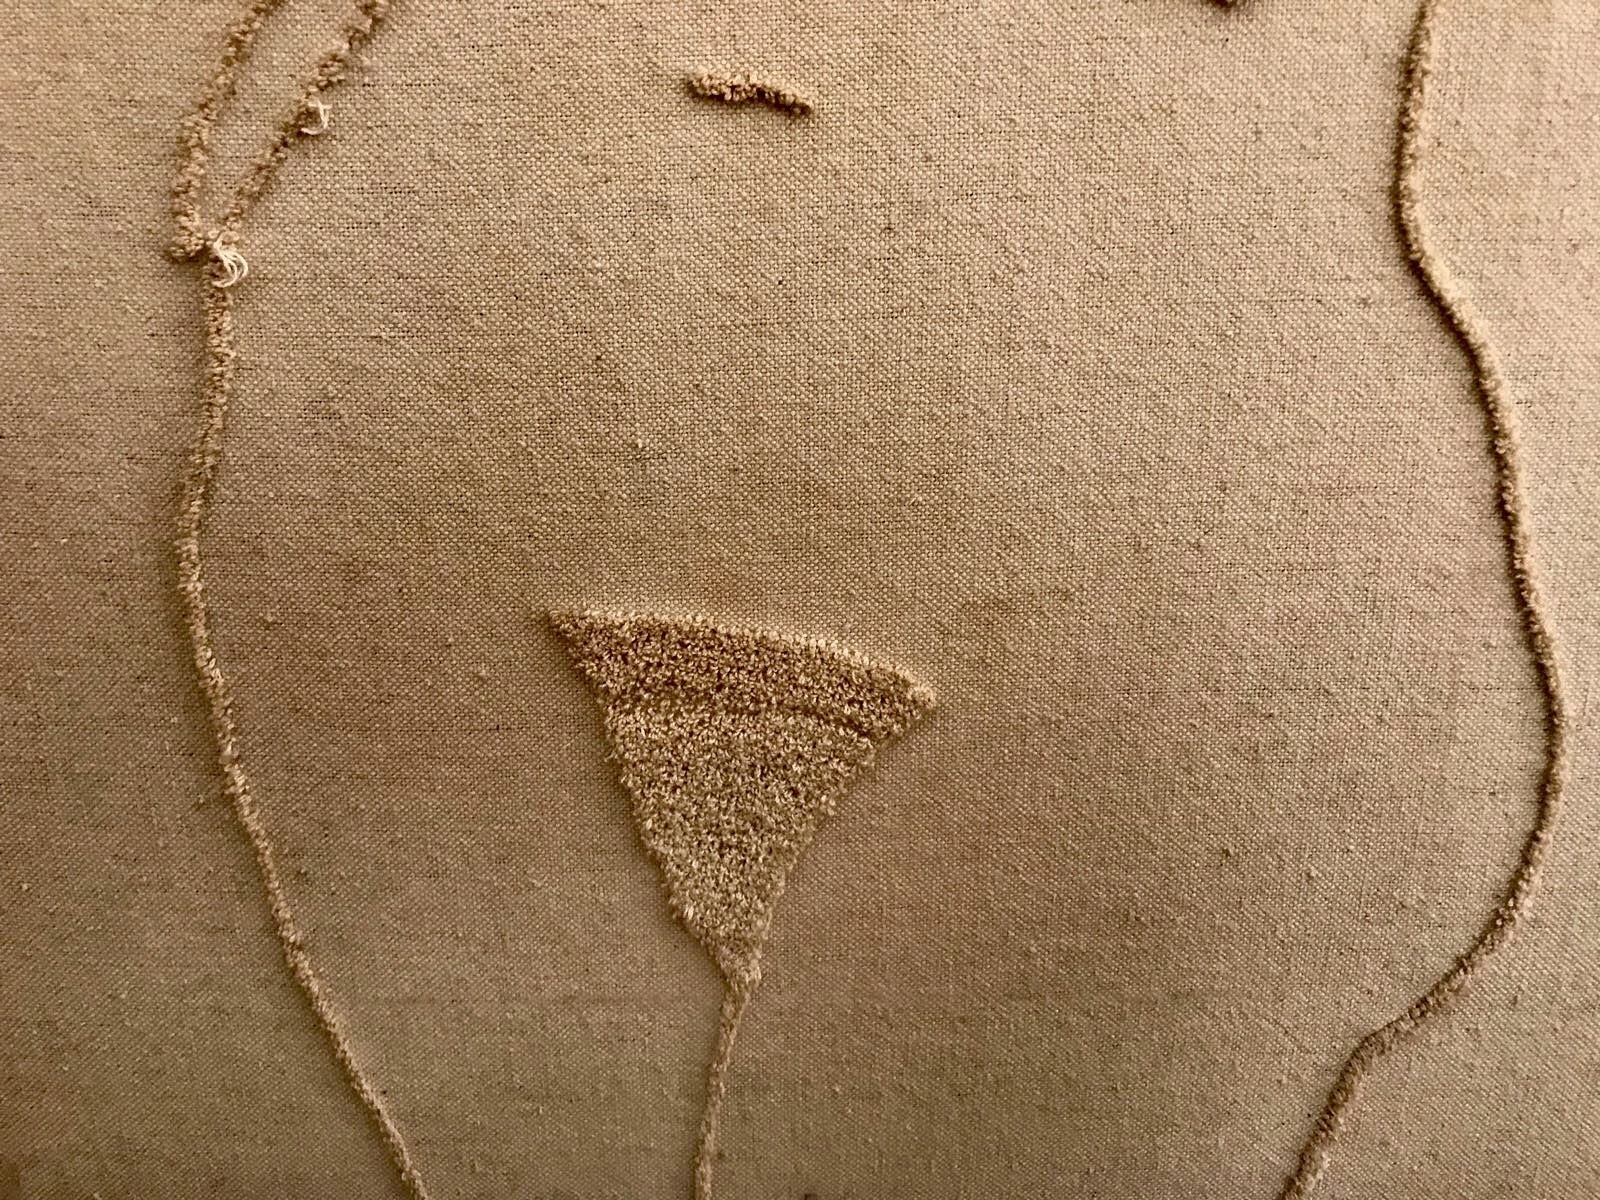 'Renata' / detail